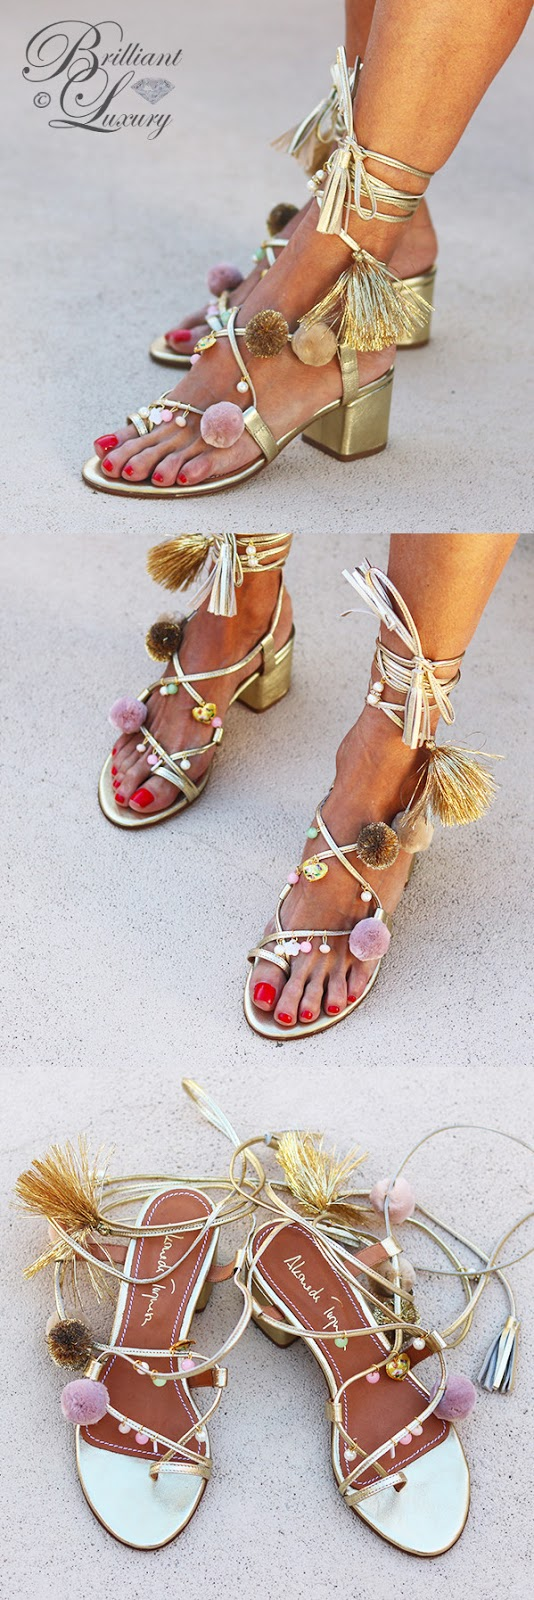 Brilliant Luxury ♦ Alameda Turquesa Adele wedges golden